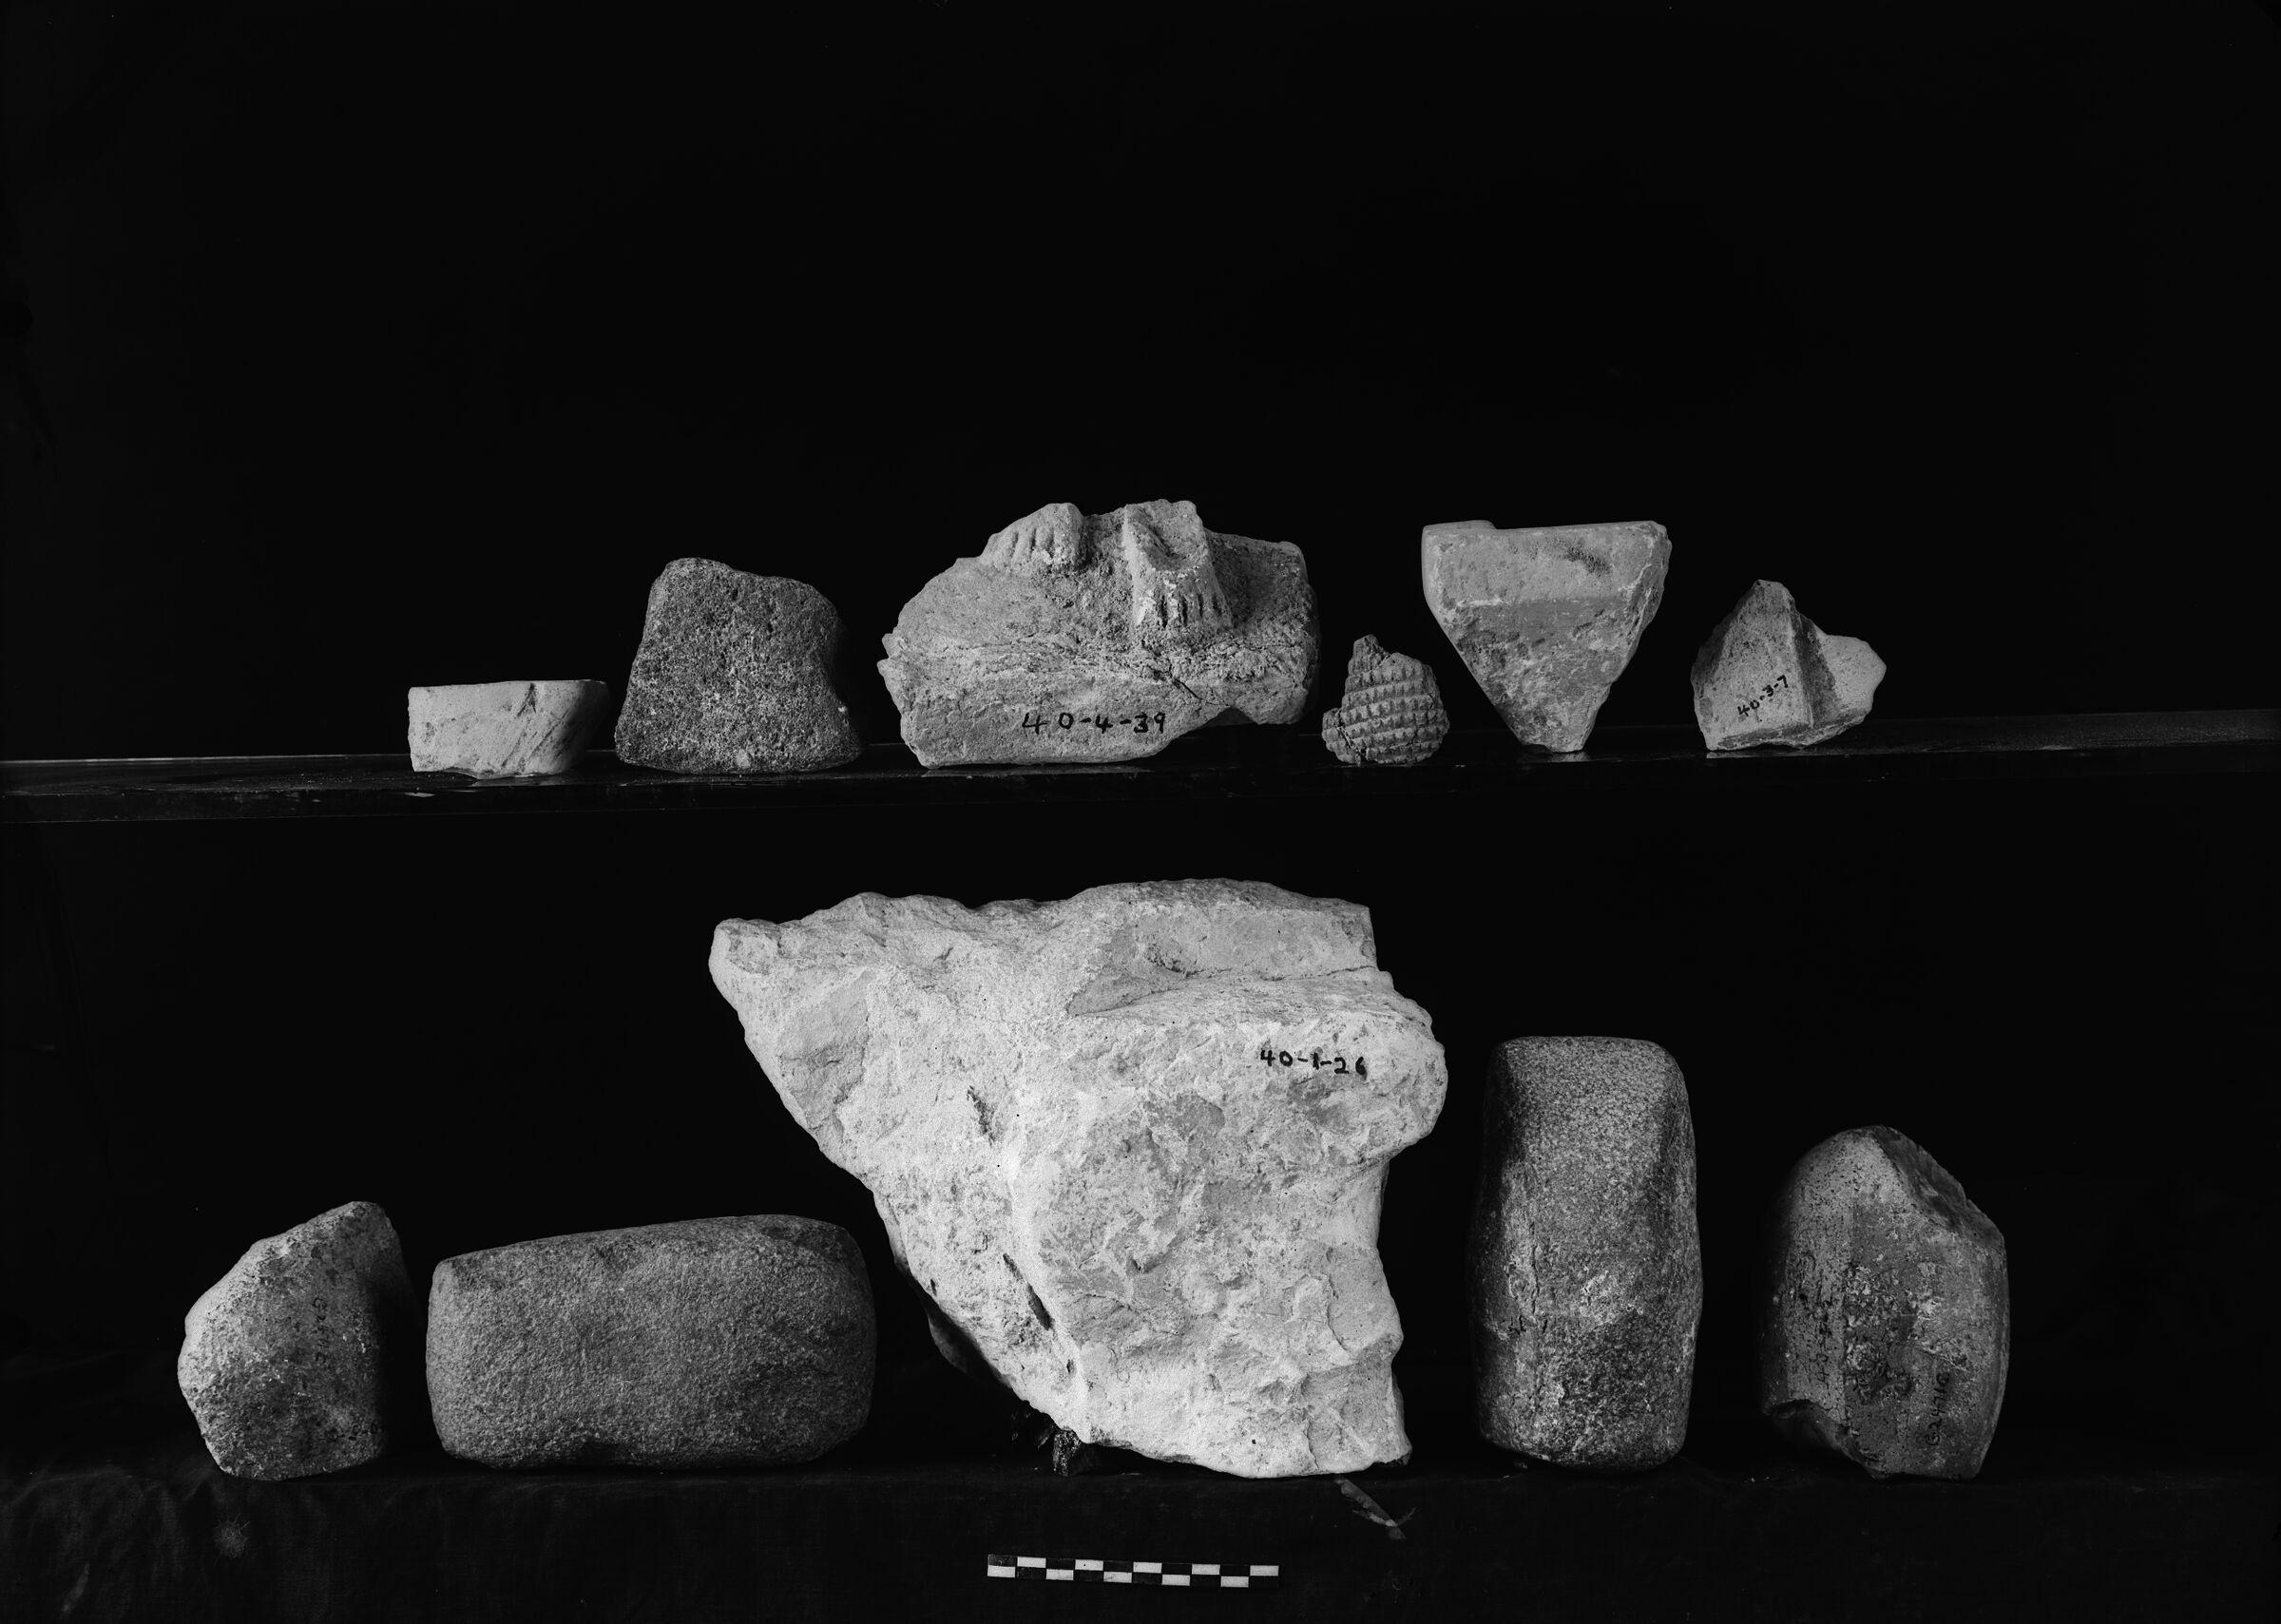 Object(s) photograph: Site: Giza; view: G 2473, G 2186, G 2438, G 2471, G 2472, G 2000, G 2350 = G 5290